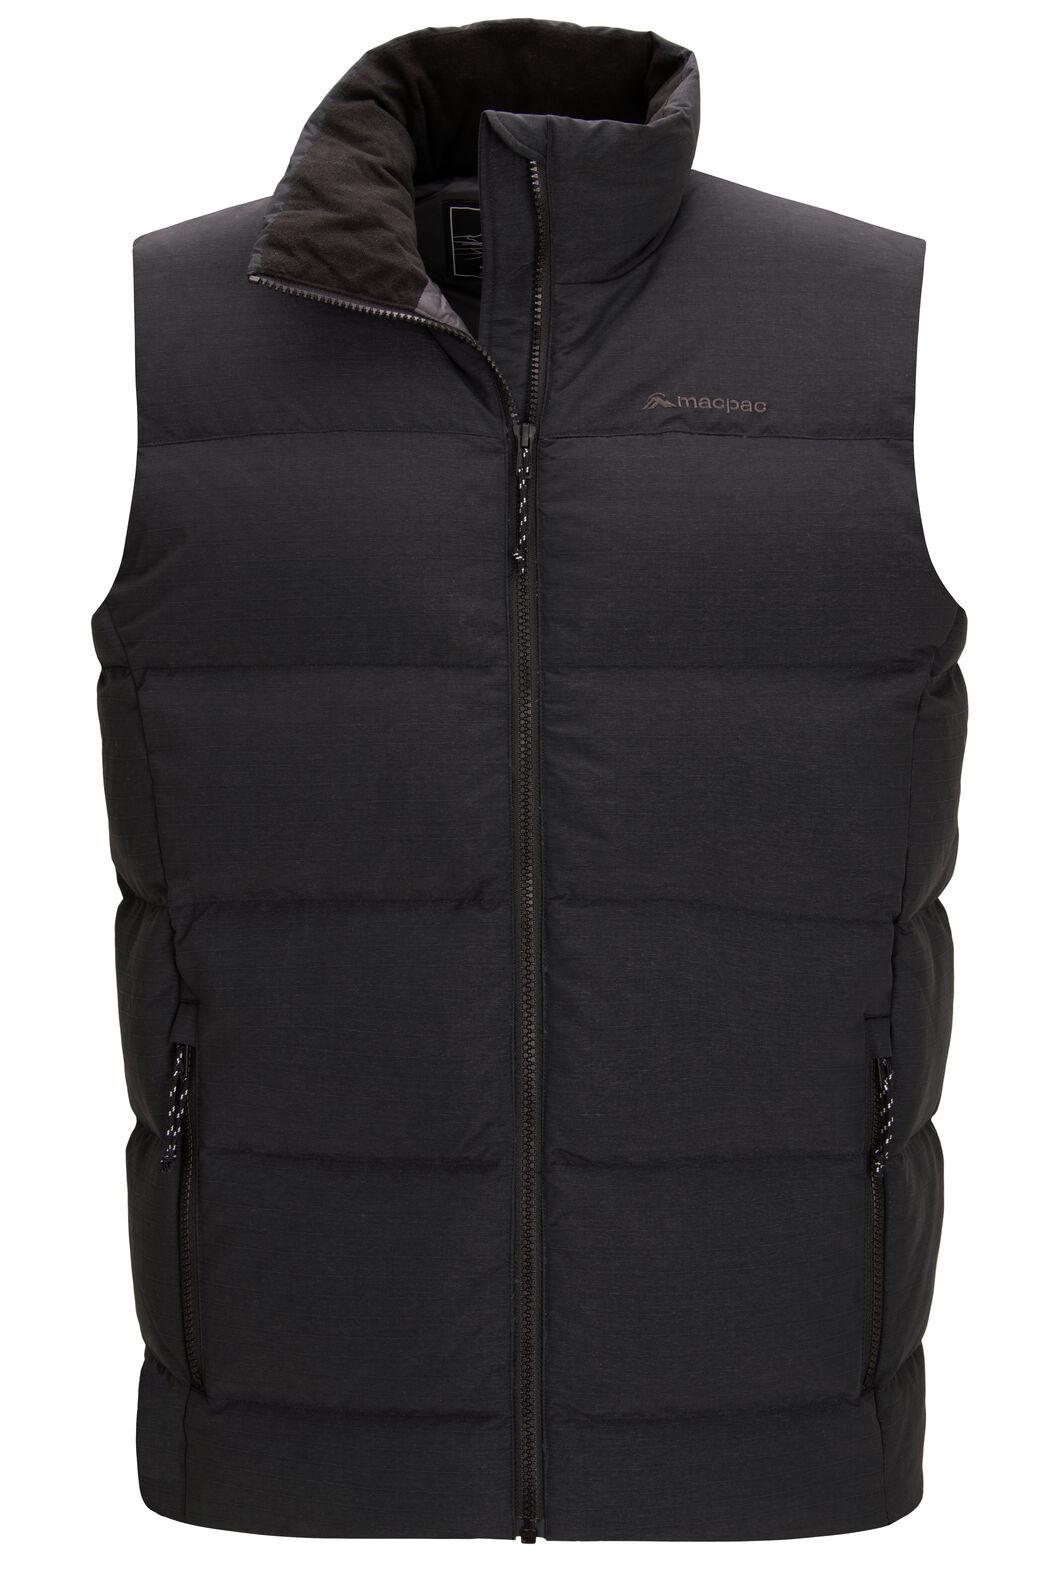 Macpac Accord Down Vest — Men's, Black, hi-res